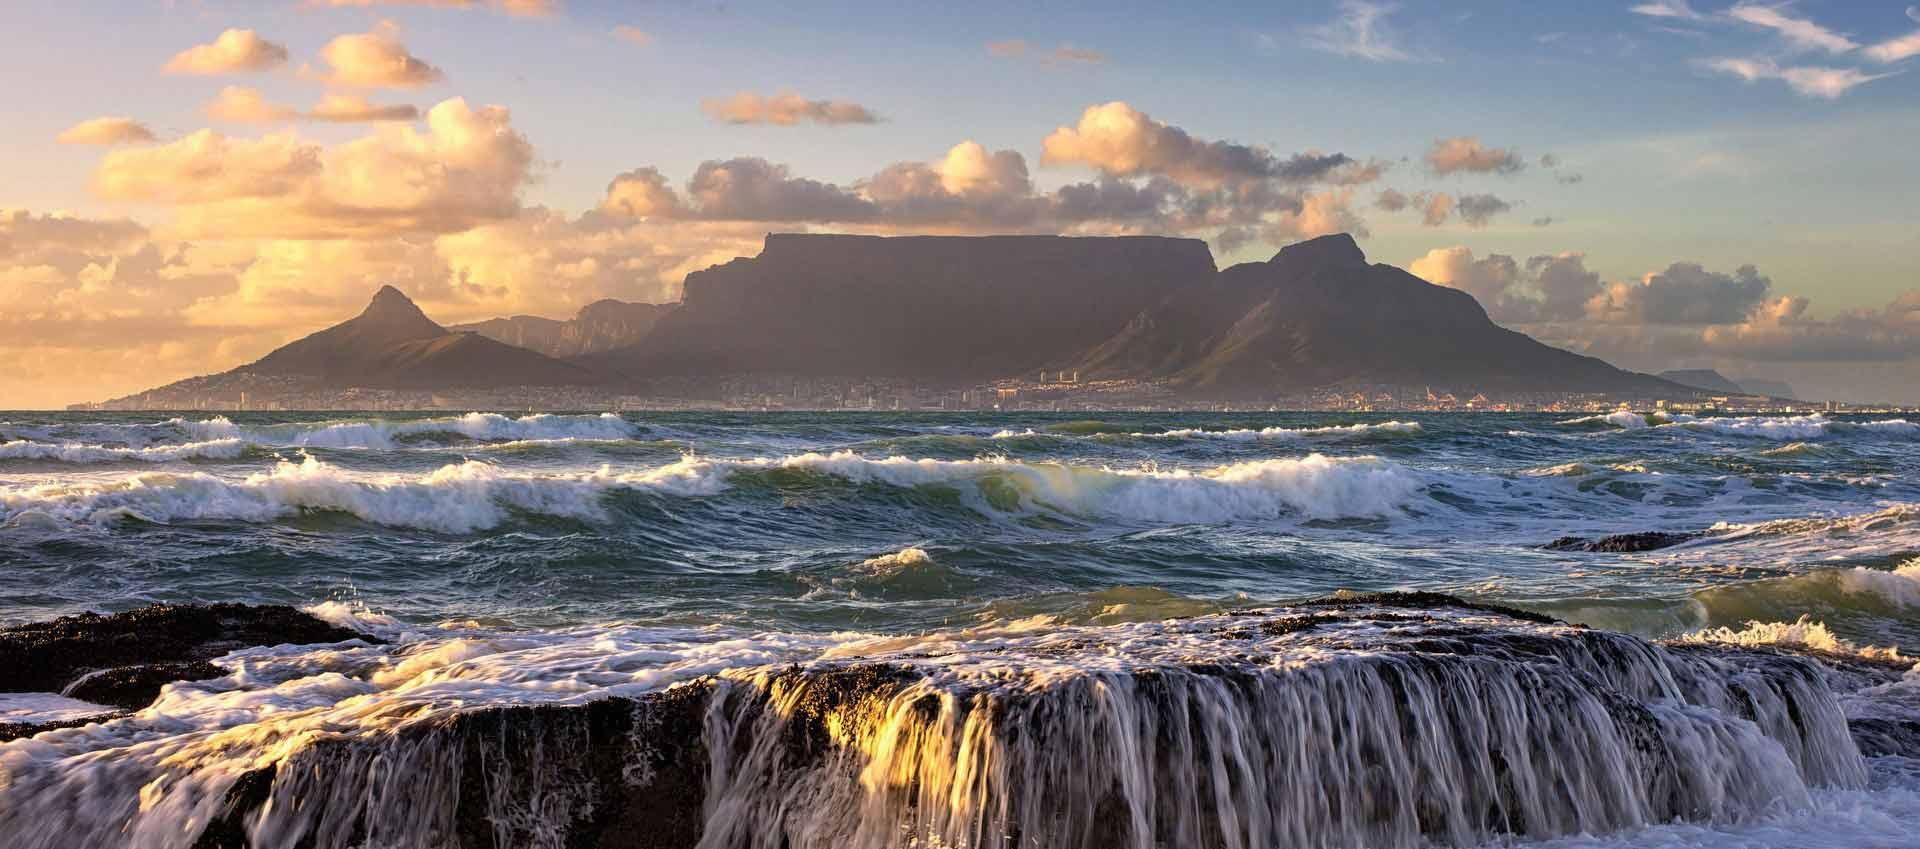 South African DMC